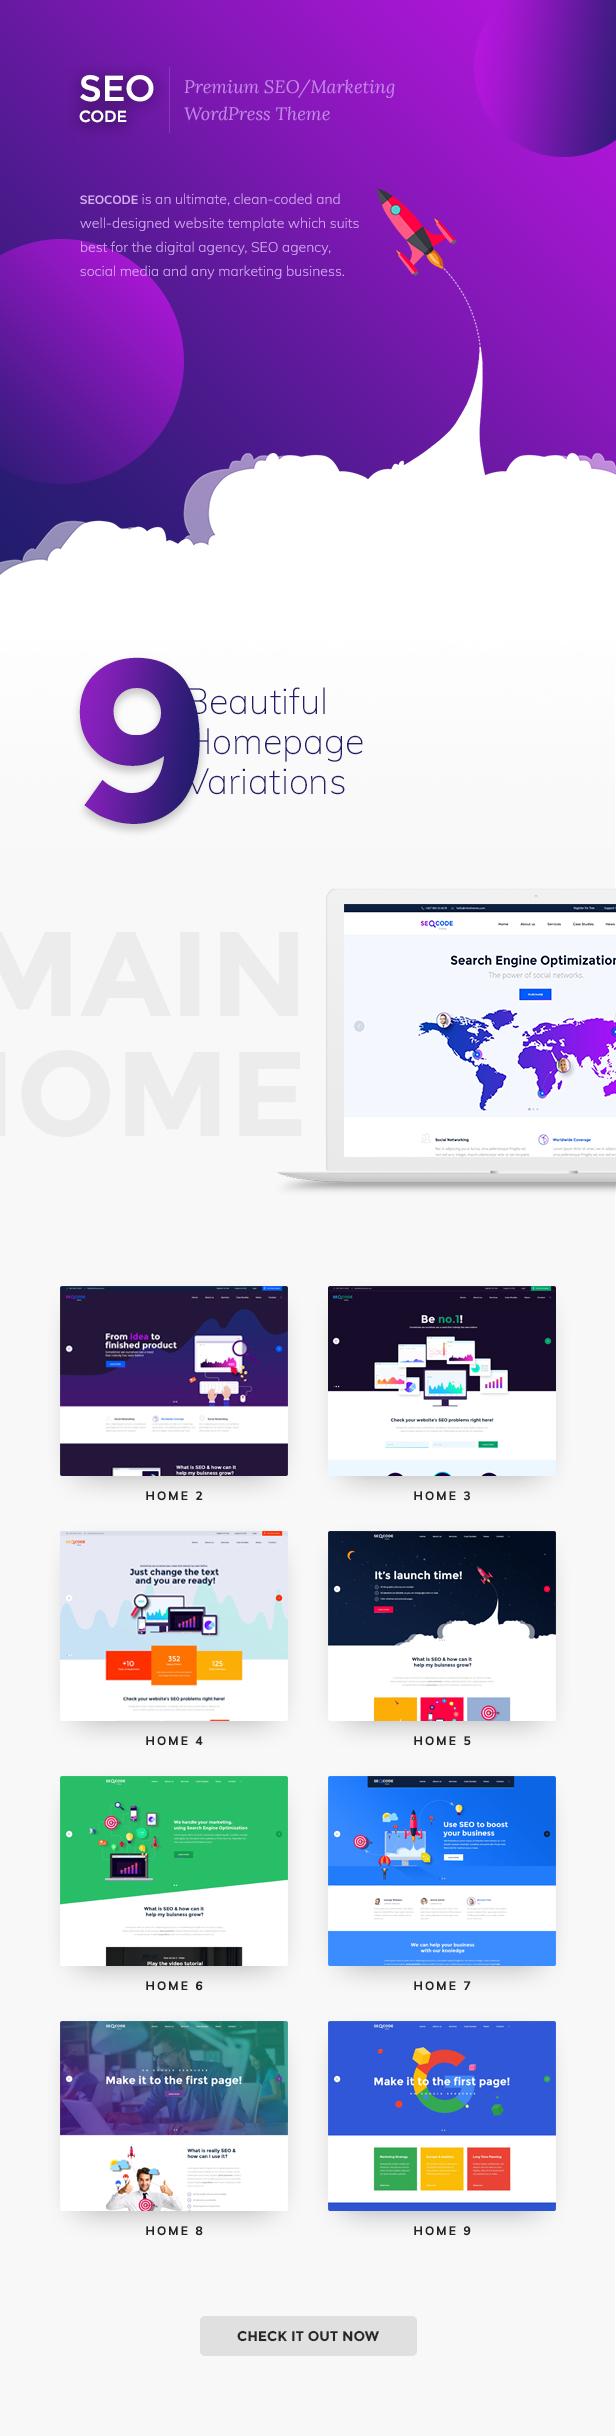 seocode-desc-homepage-variation